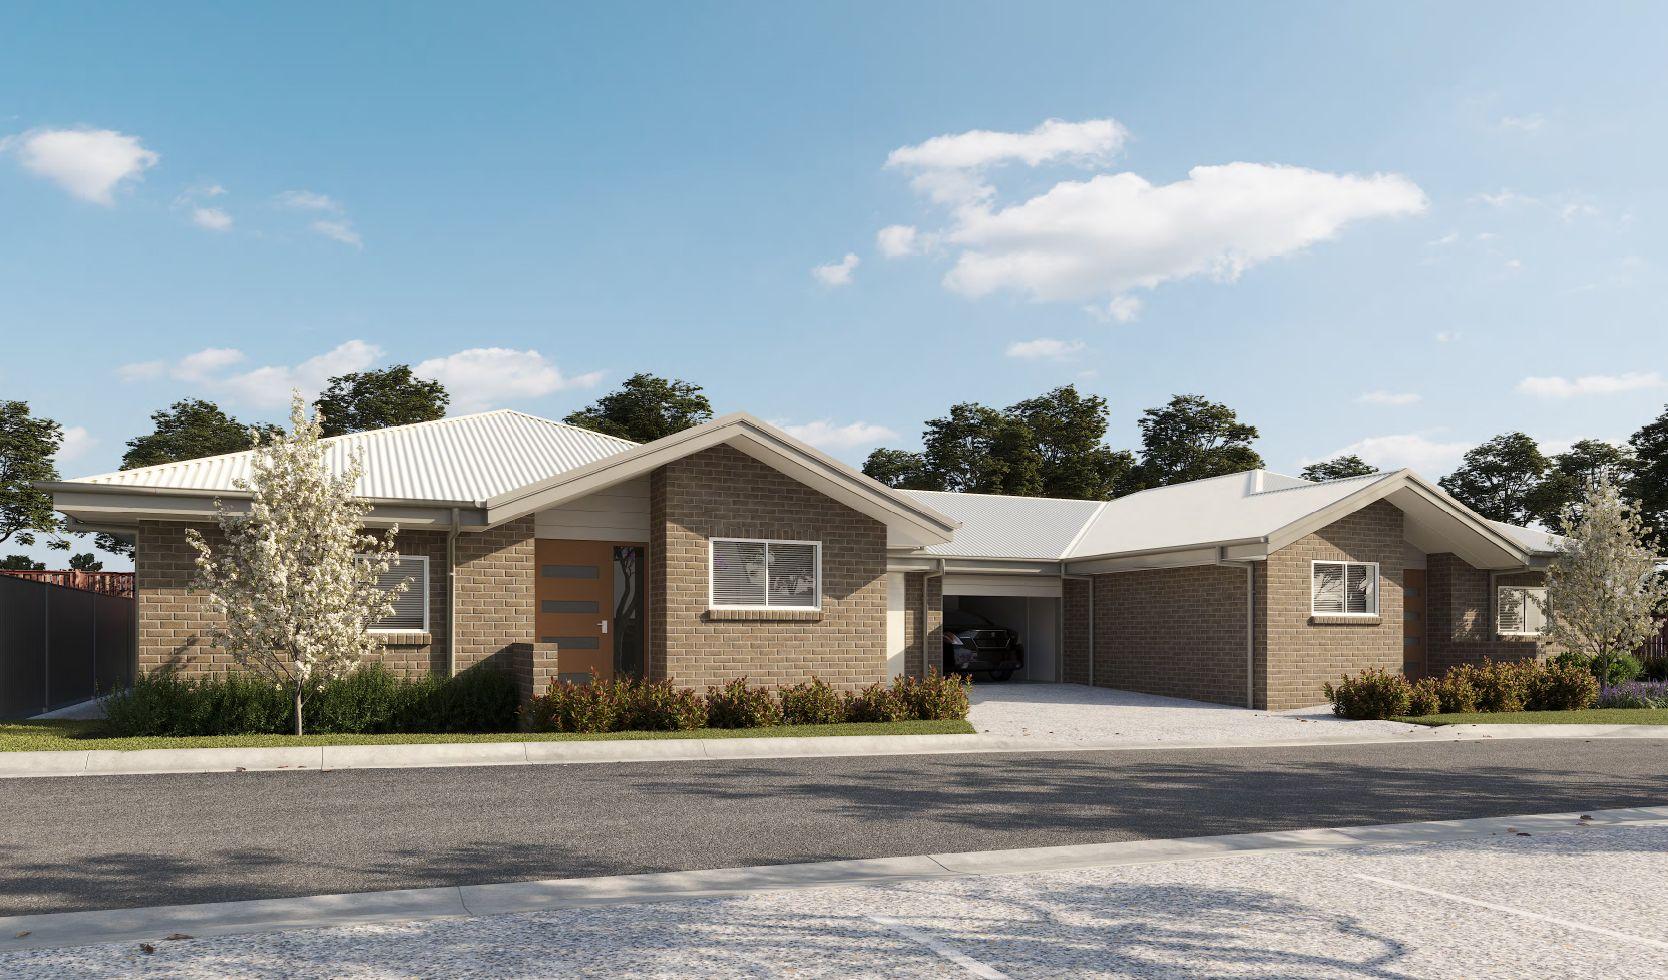 Oaktree Boolaroo, 18 Guest Street, Boolaroo NSW 2284 - Villa For